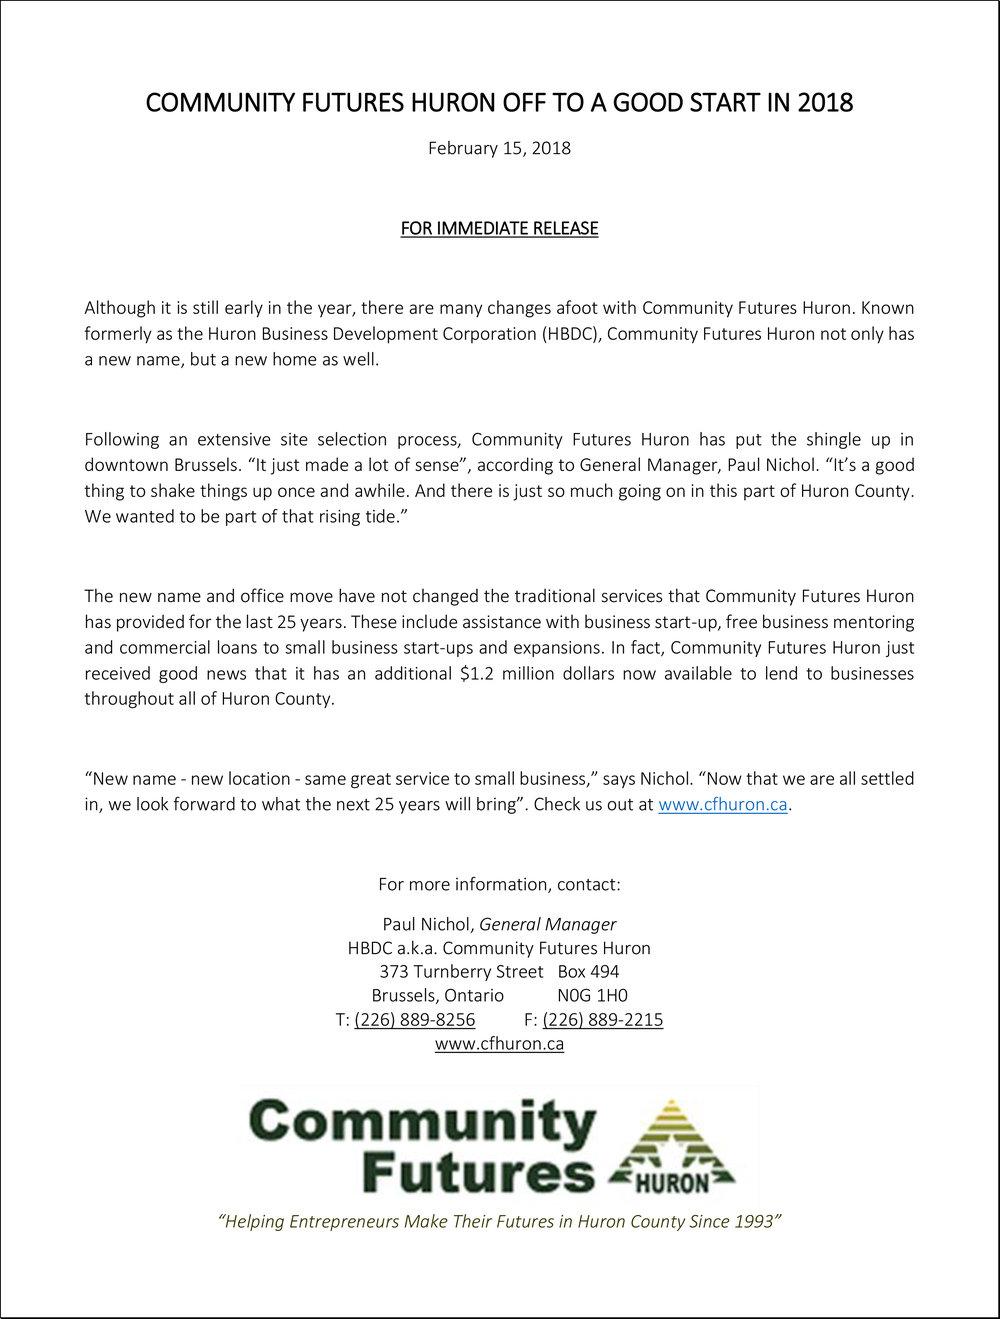 CFH Media Release Feb 2018-1.jpg